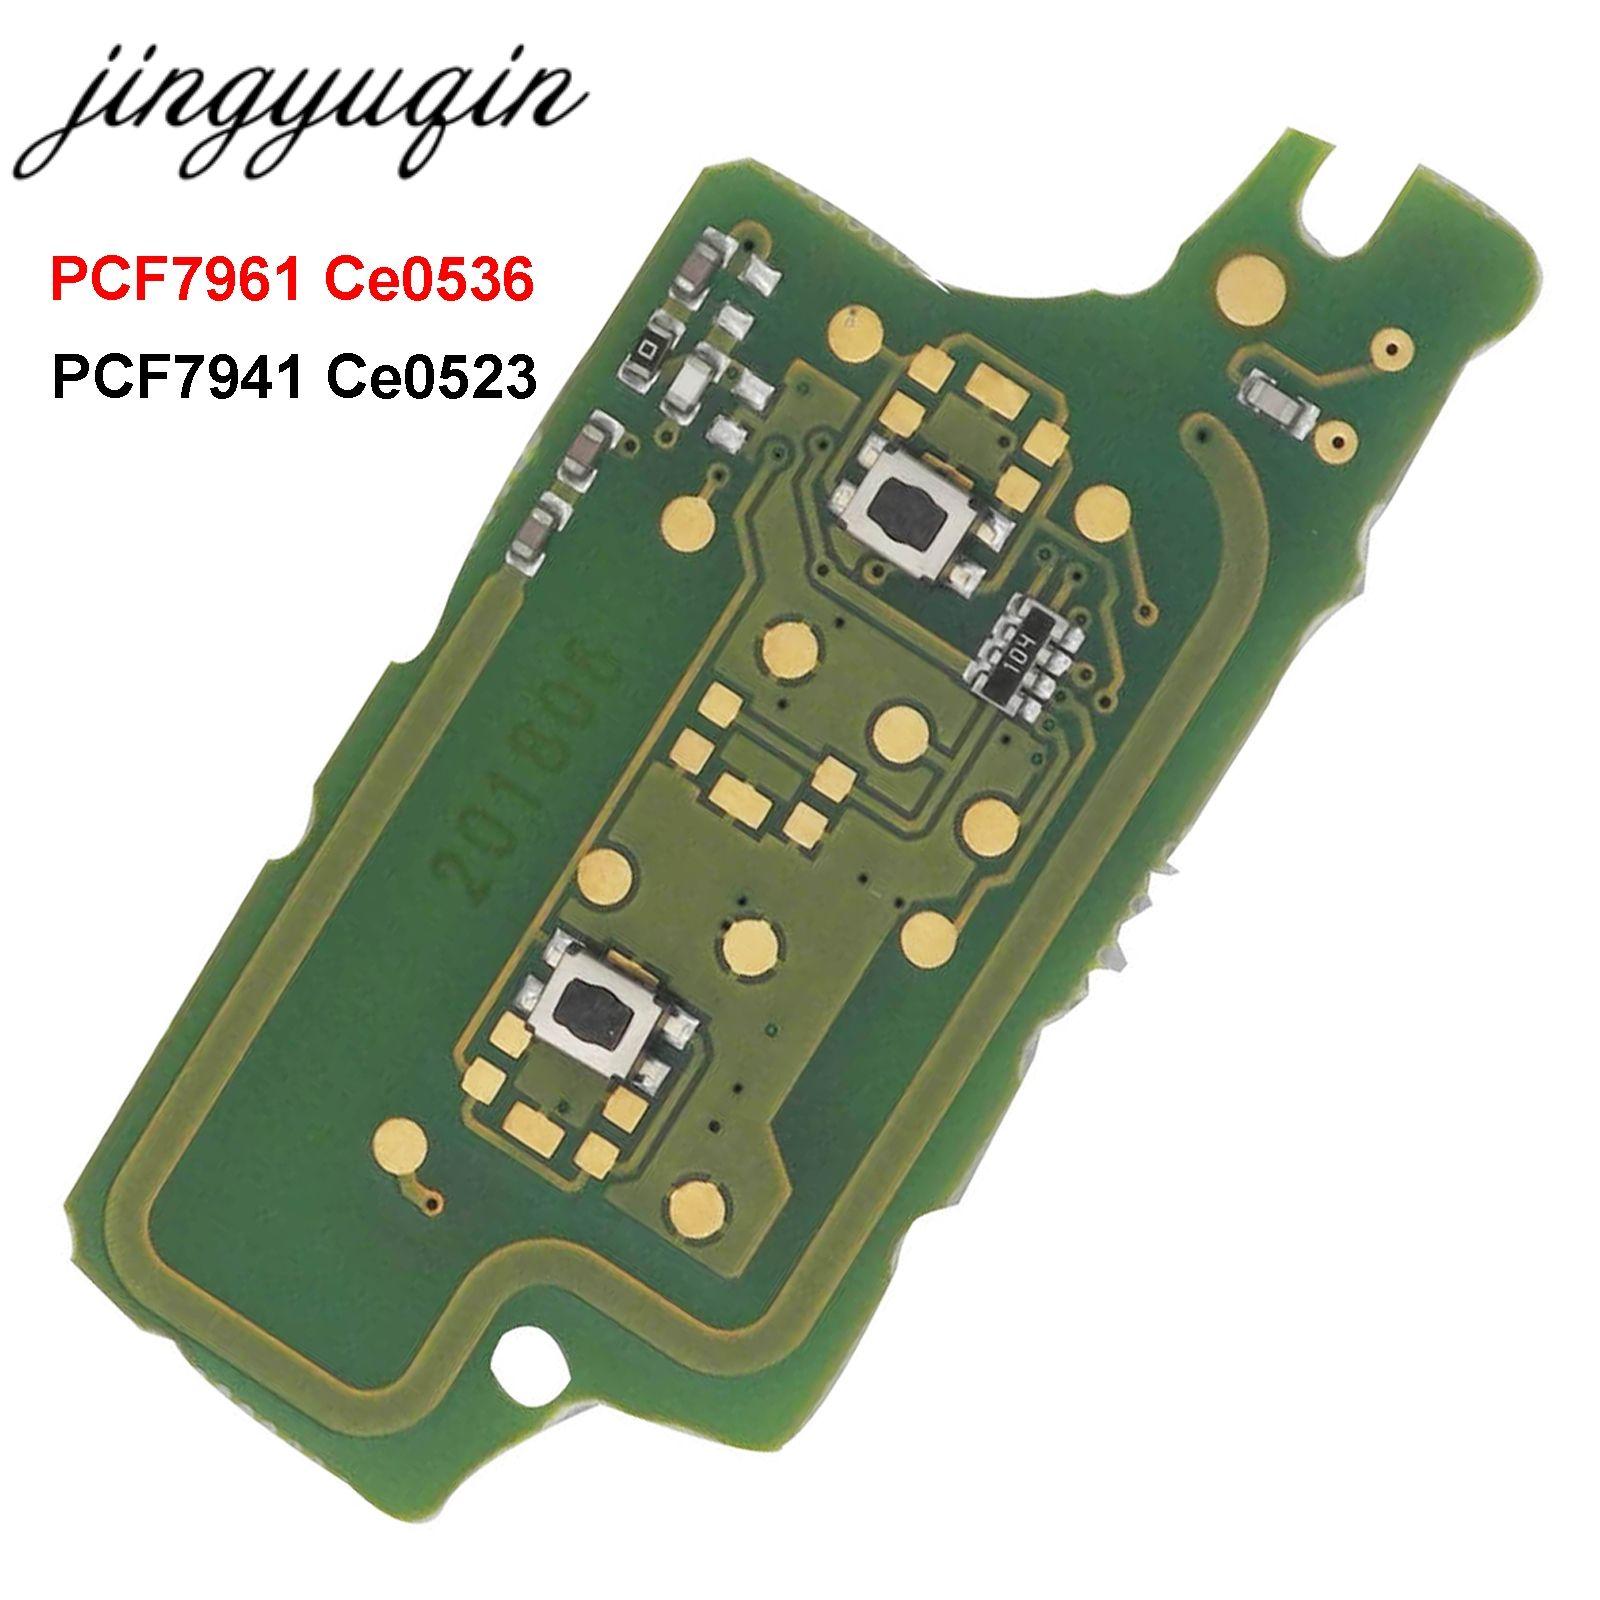 Jingyuqin 2B Fernbedienung Flip Auto Schlüssel Elektronische Bord Für Peugeot 307 308 408 407 207 Citroen C2 C3 C4 PICASSO 7961 7941 CE0536/523